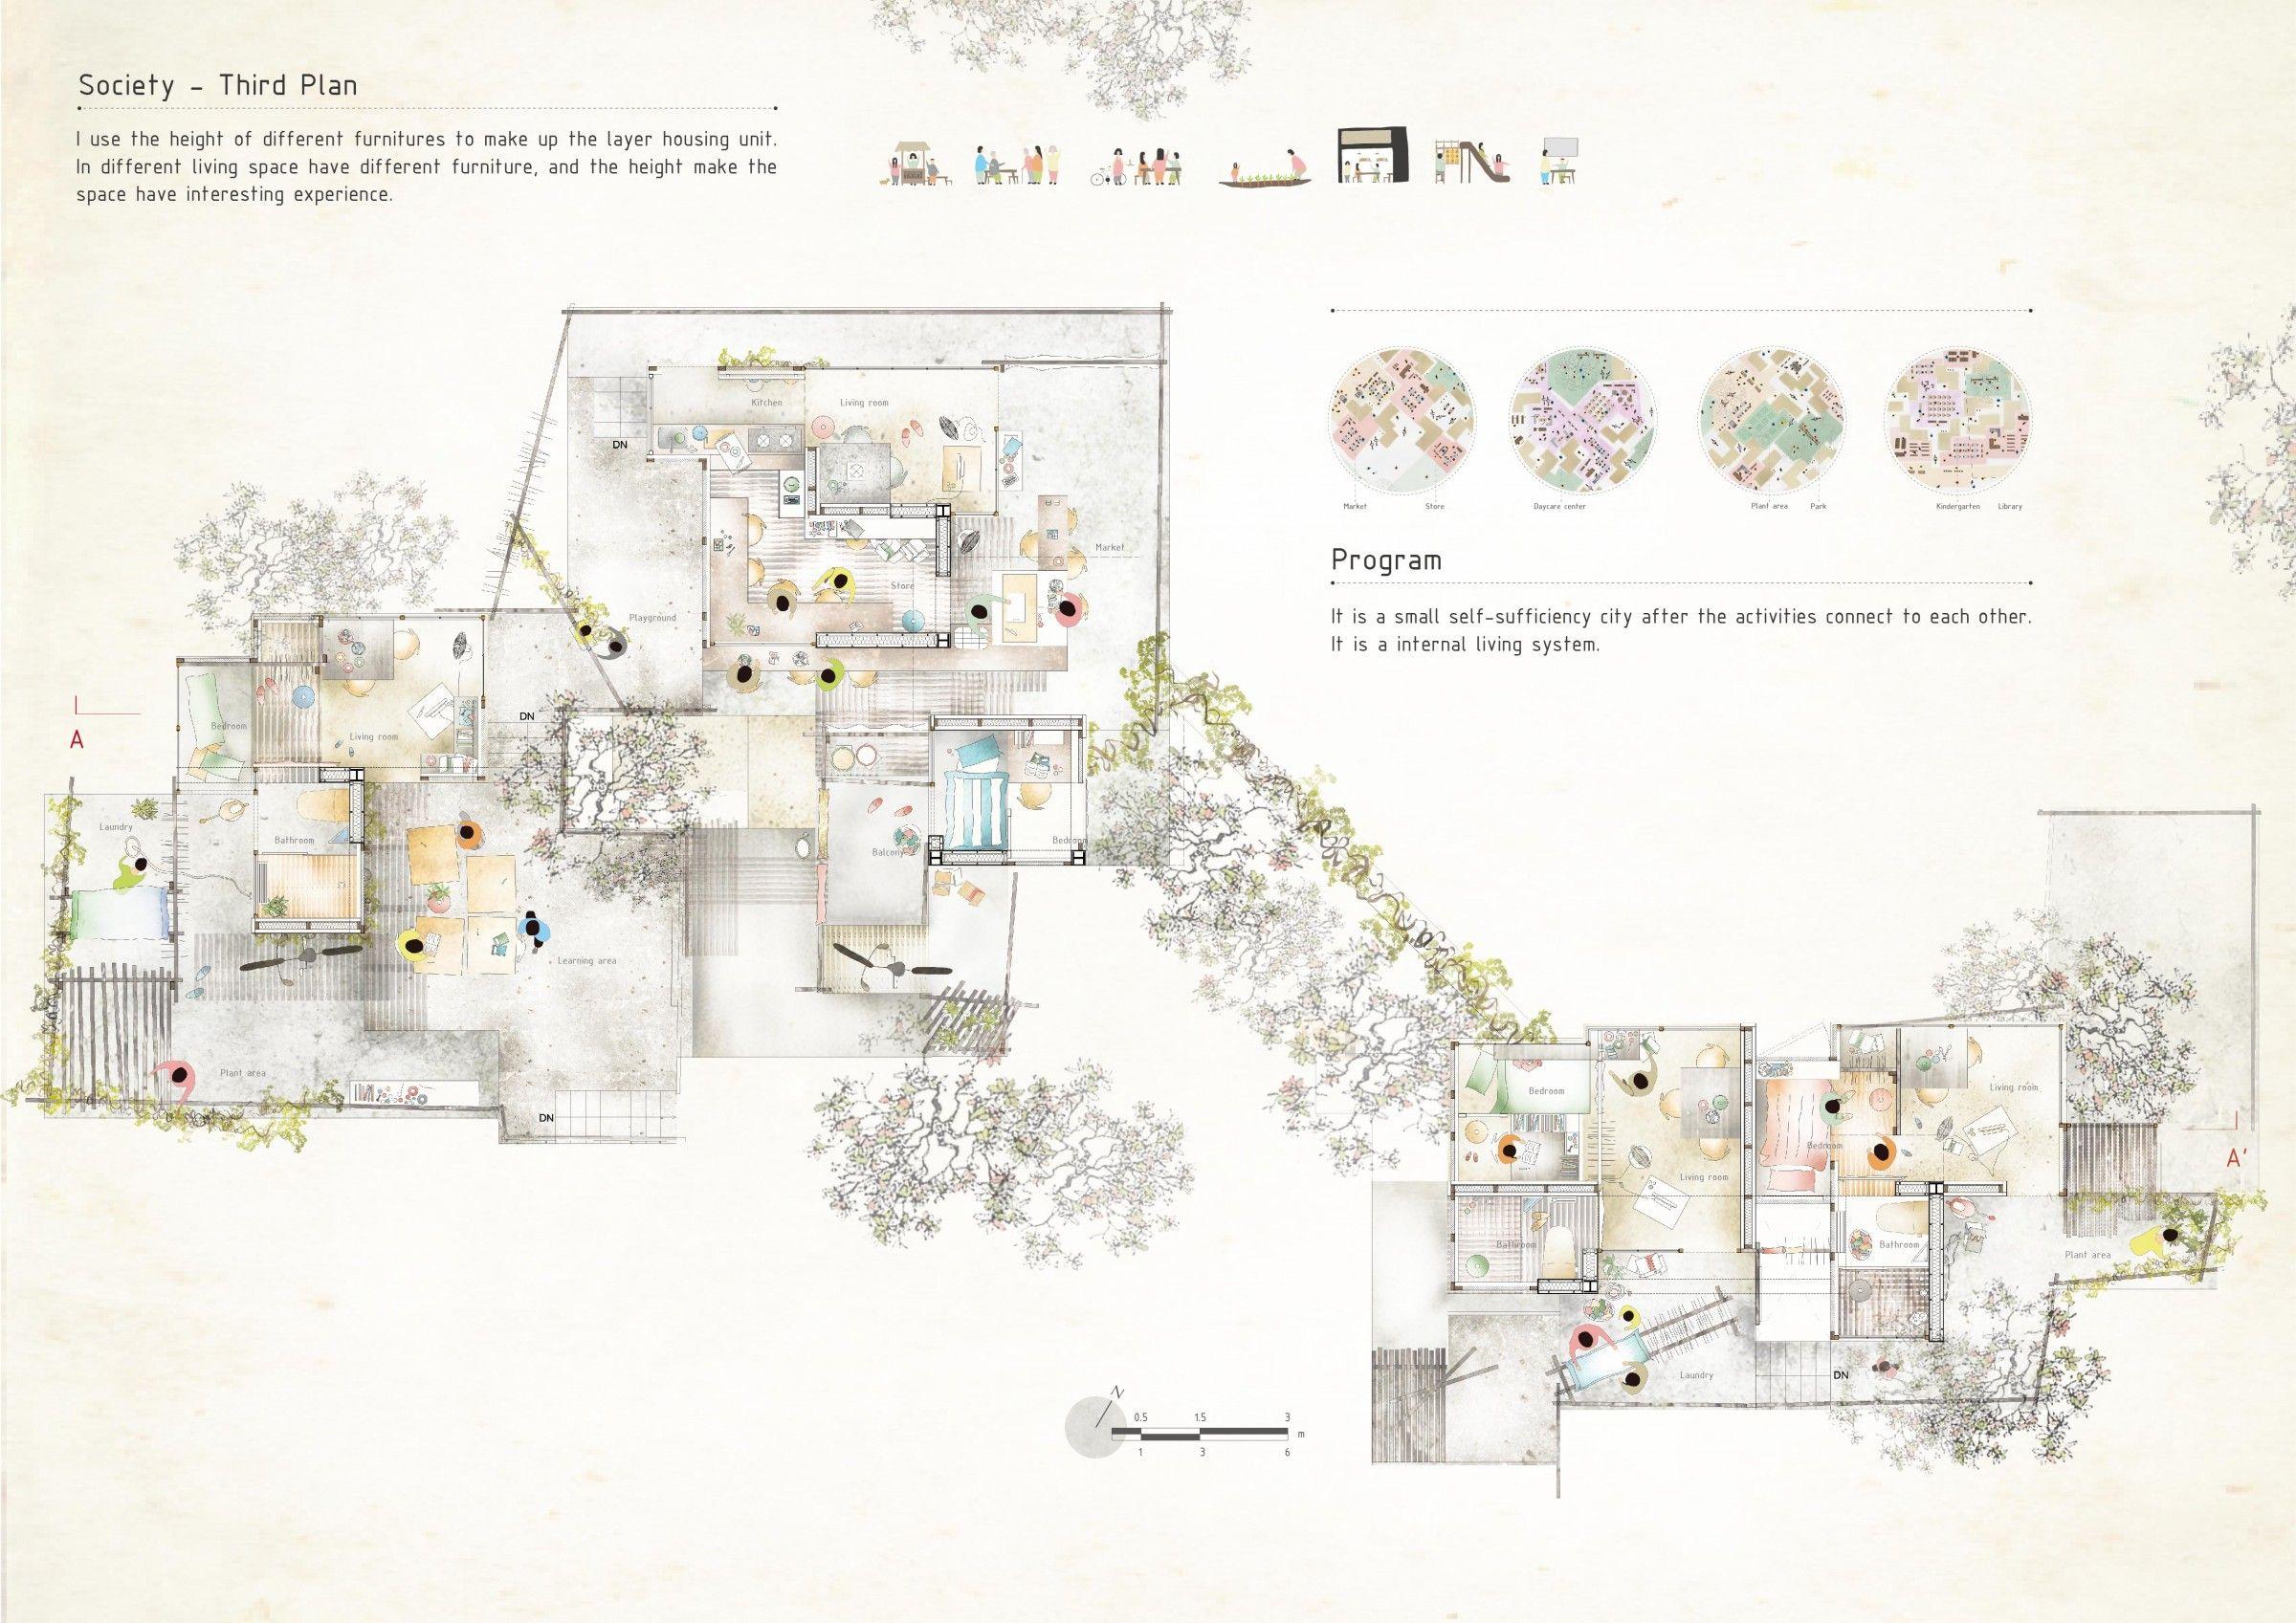 architecture rendering presentation perspective plan model